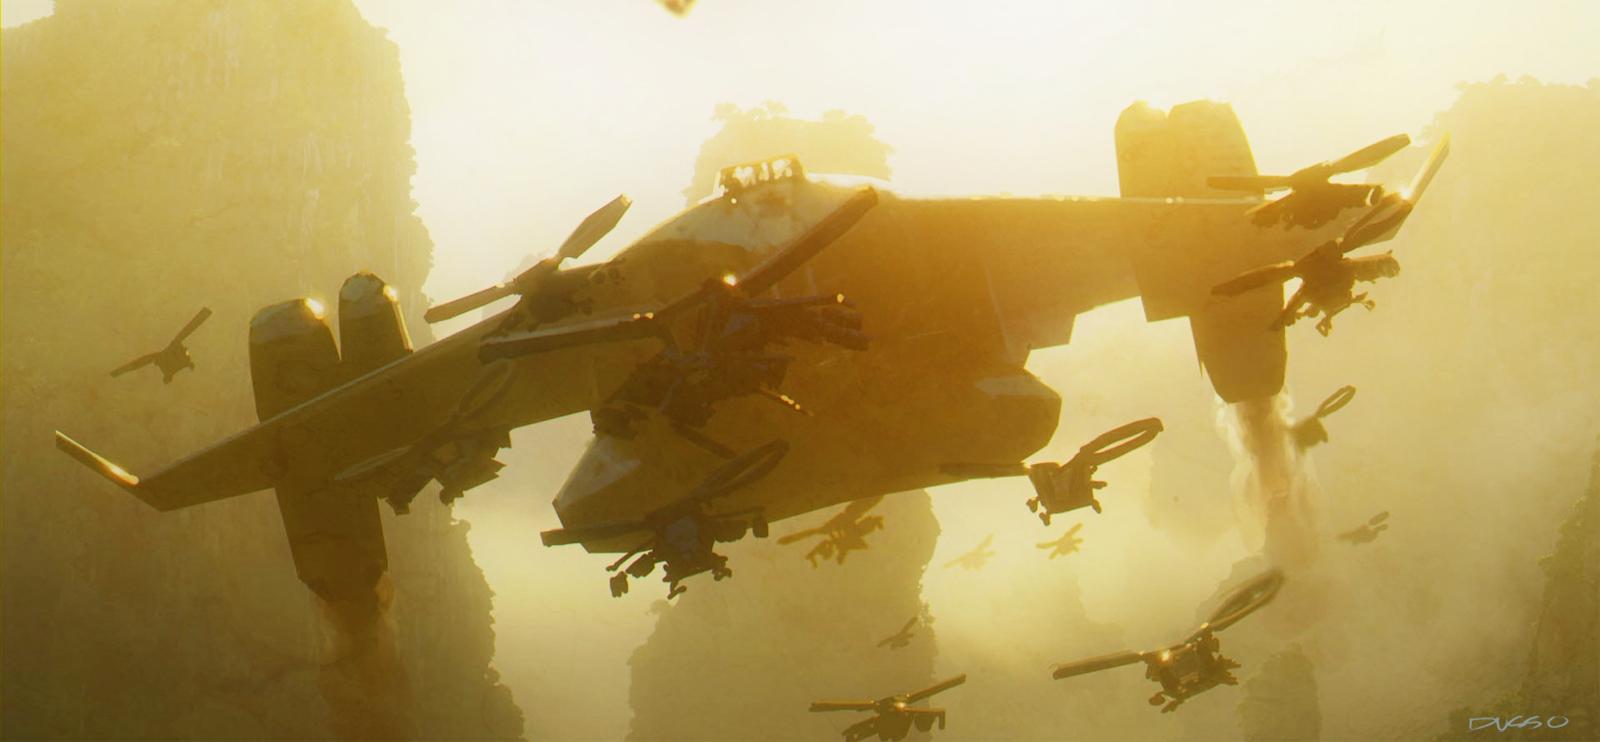 concept-art-dusseault-multiple-spaceships